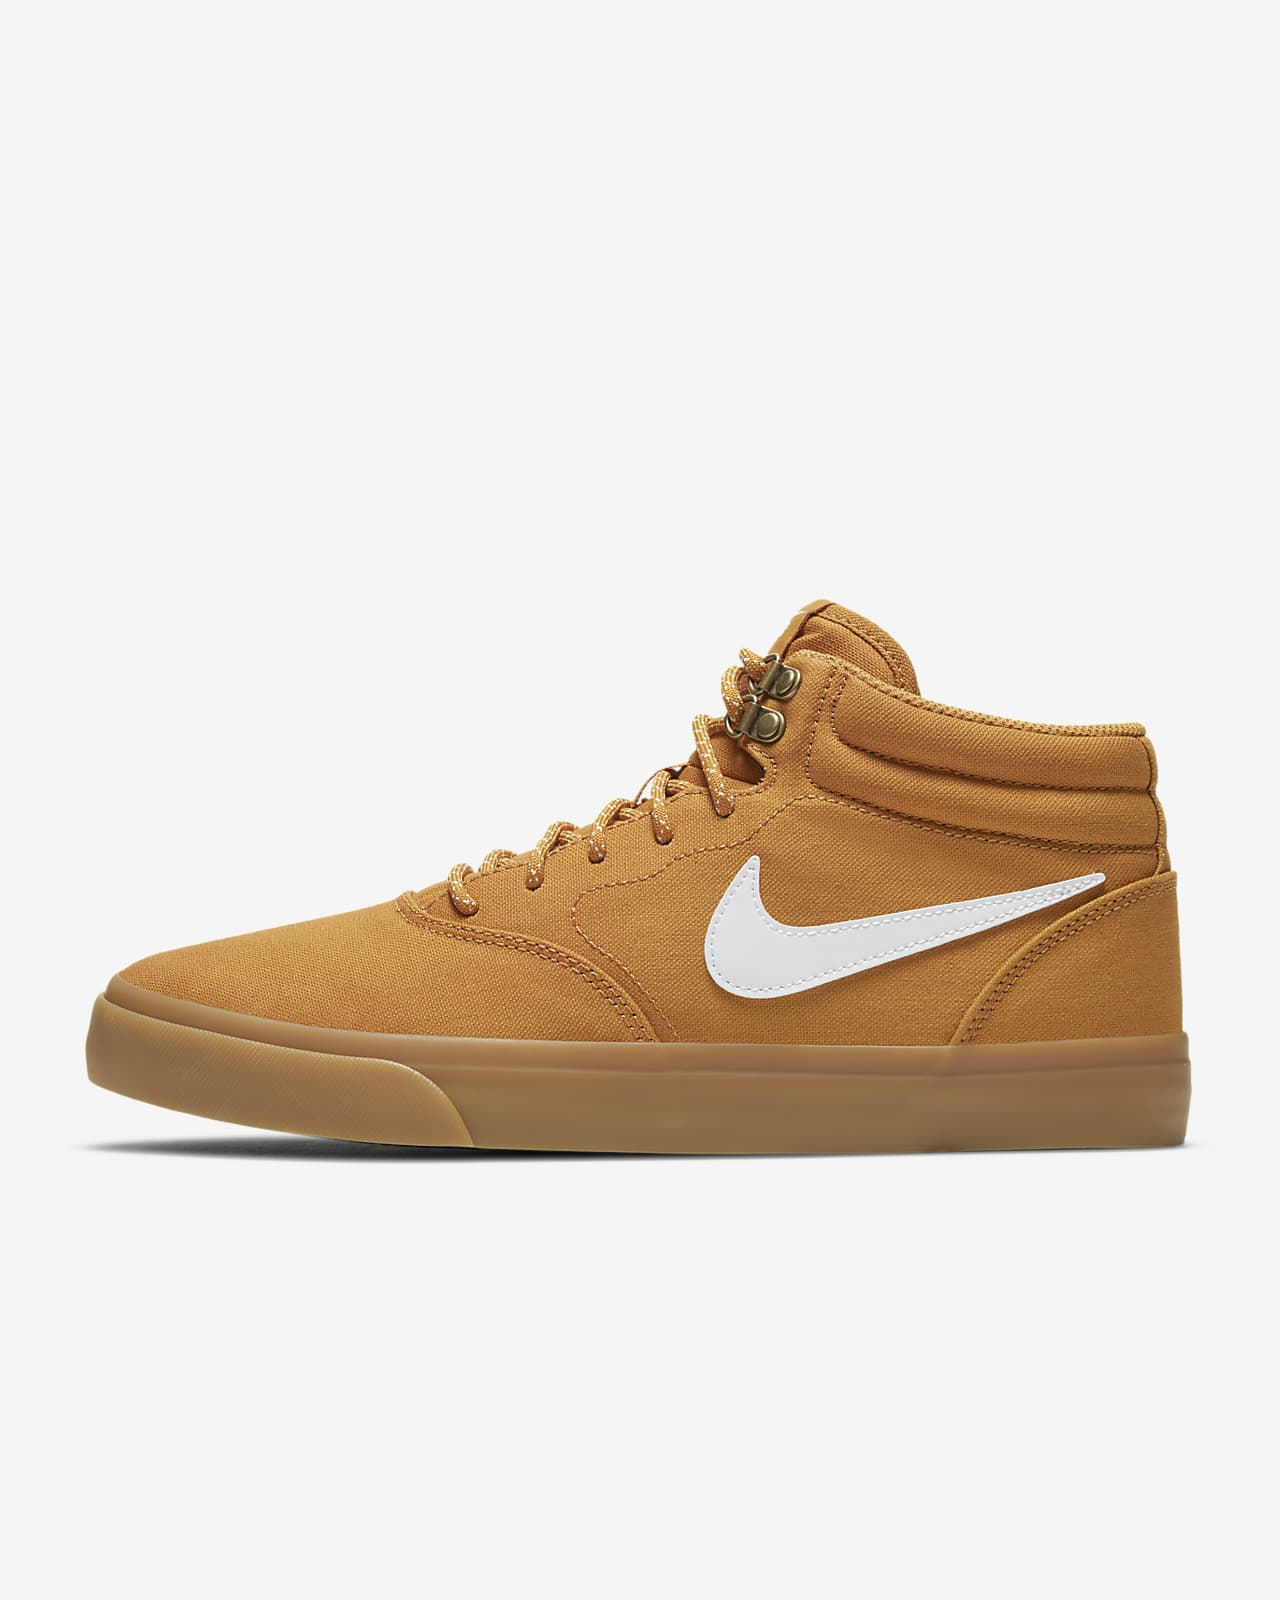 Nike SB Charge Mid PRM 男/女滑板鞋